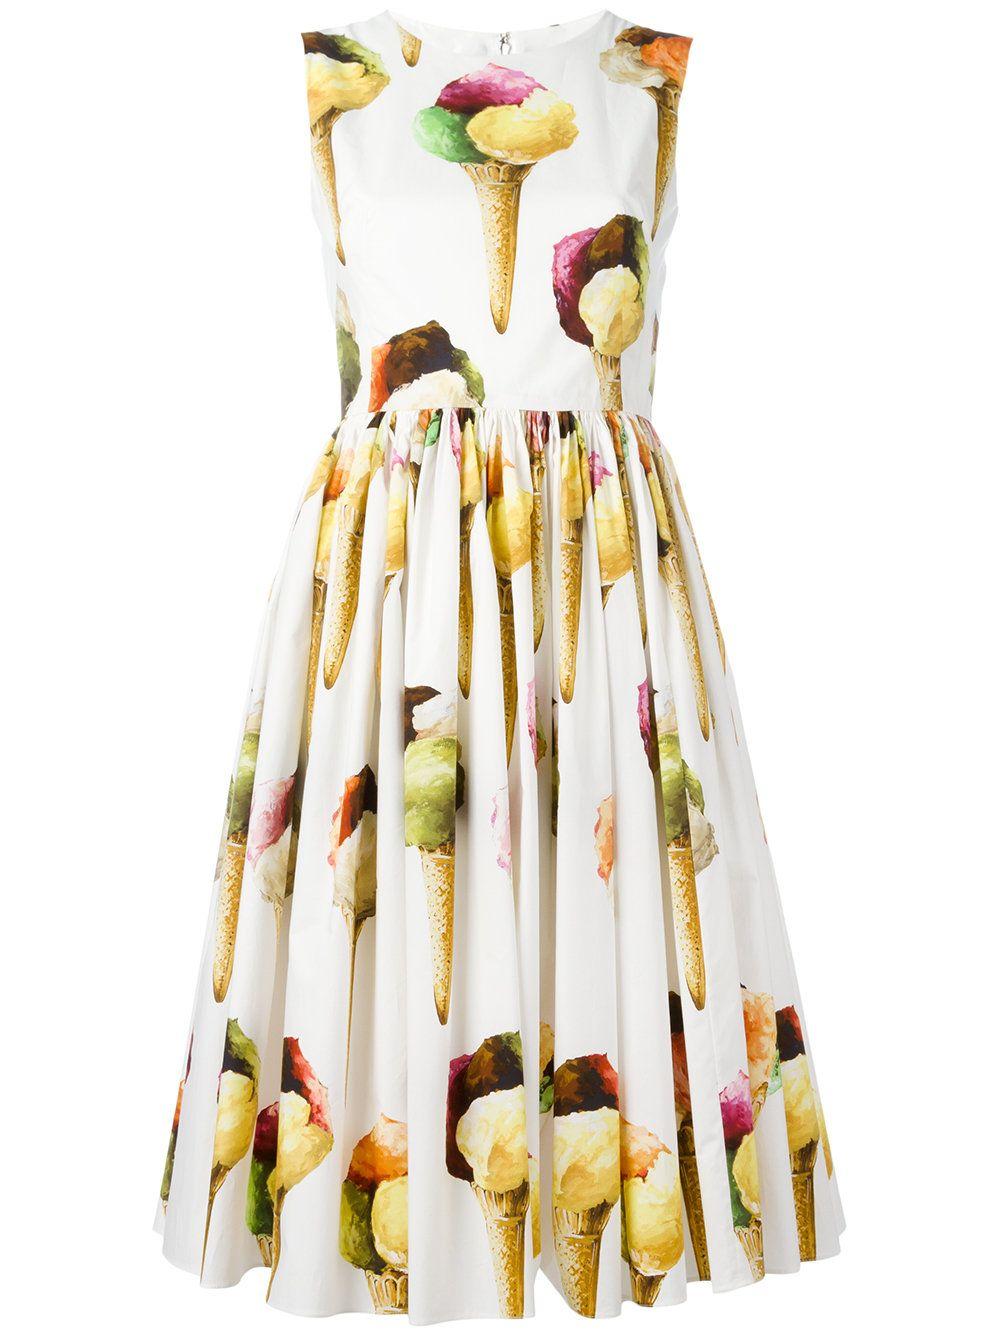 5baeb2af28 DOLCE   GABBANA ice-cream print dress